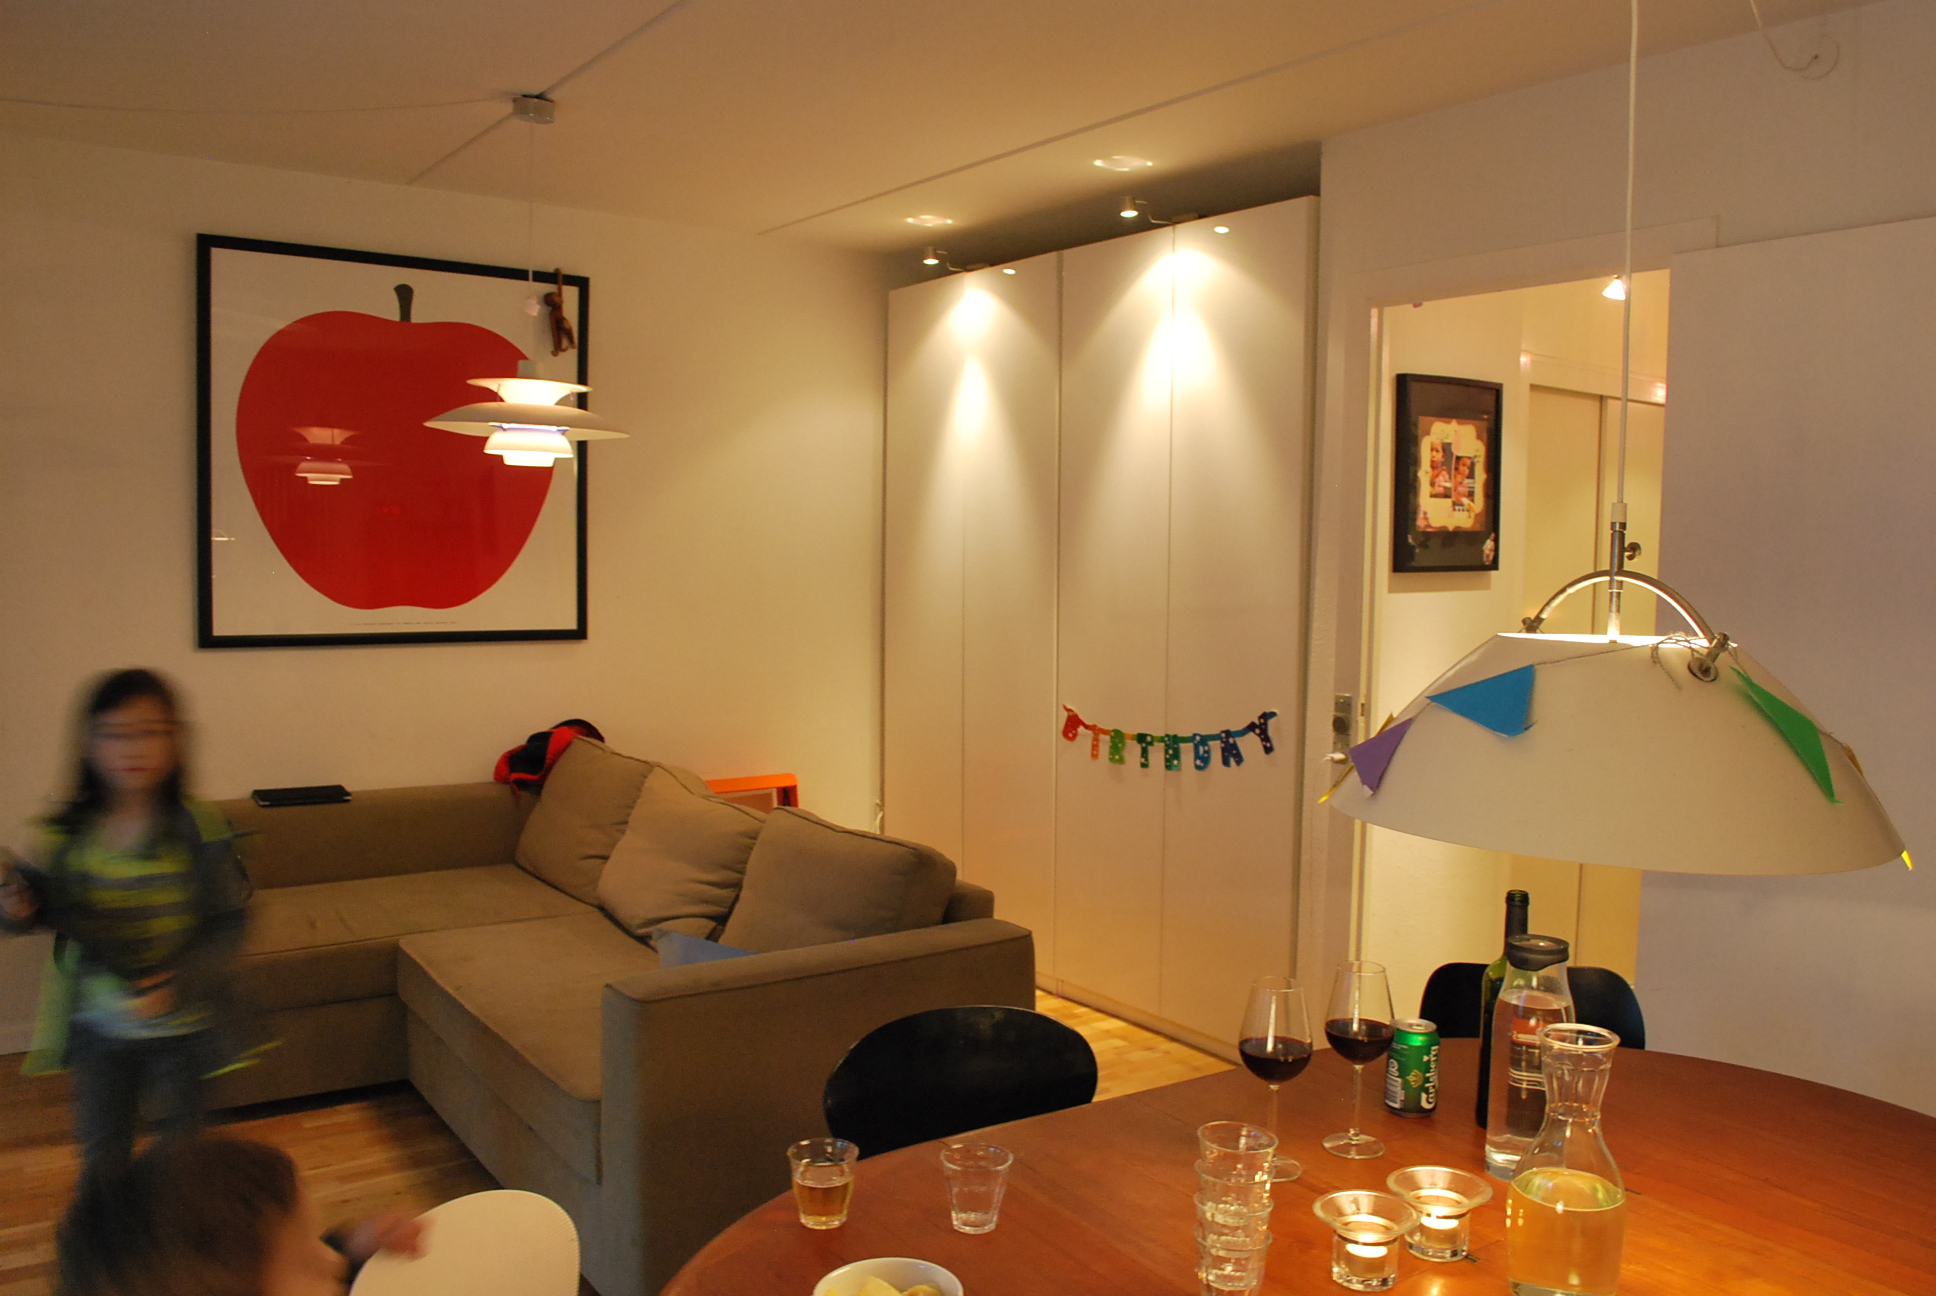 http://www.sora-design.com/images/bl-3043.jpg